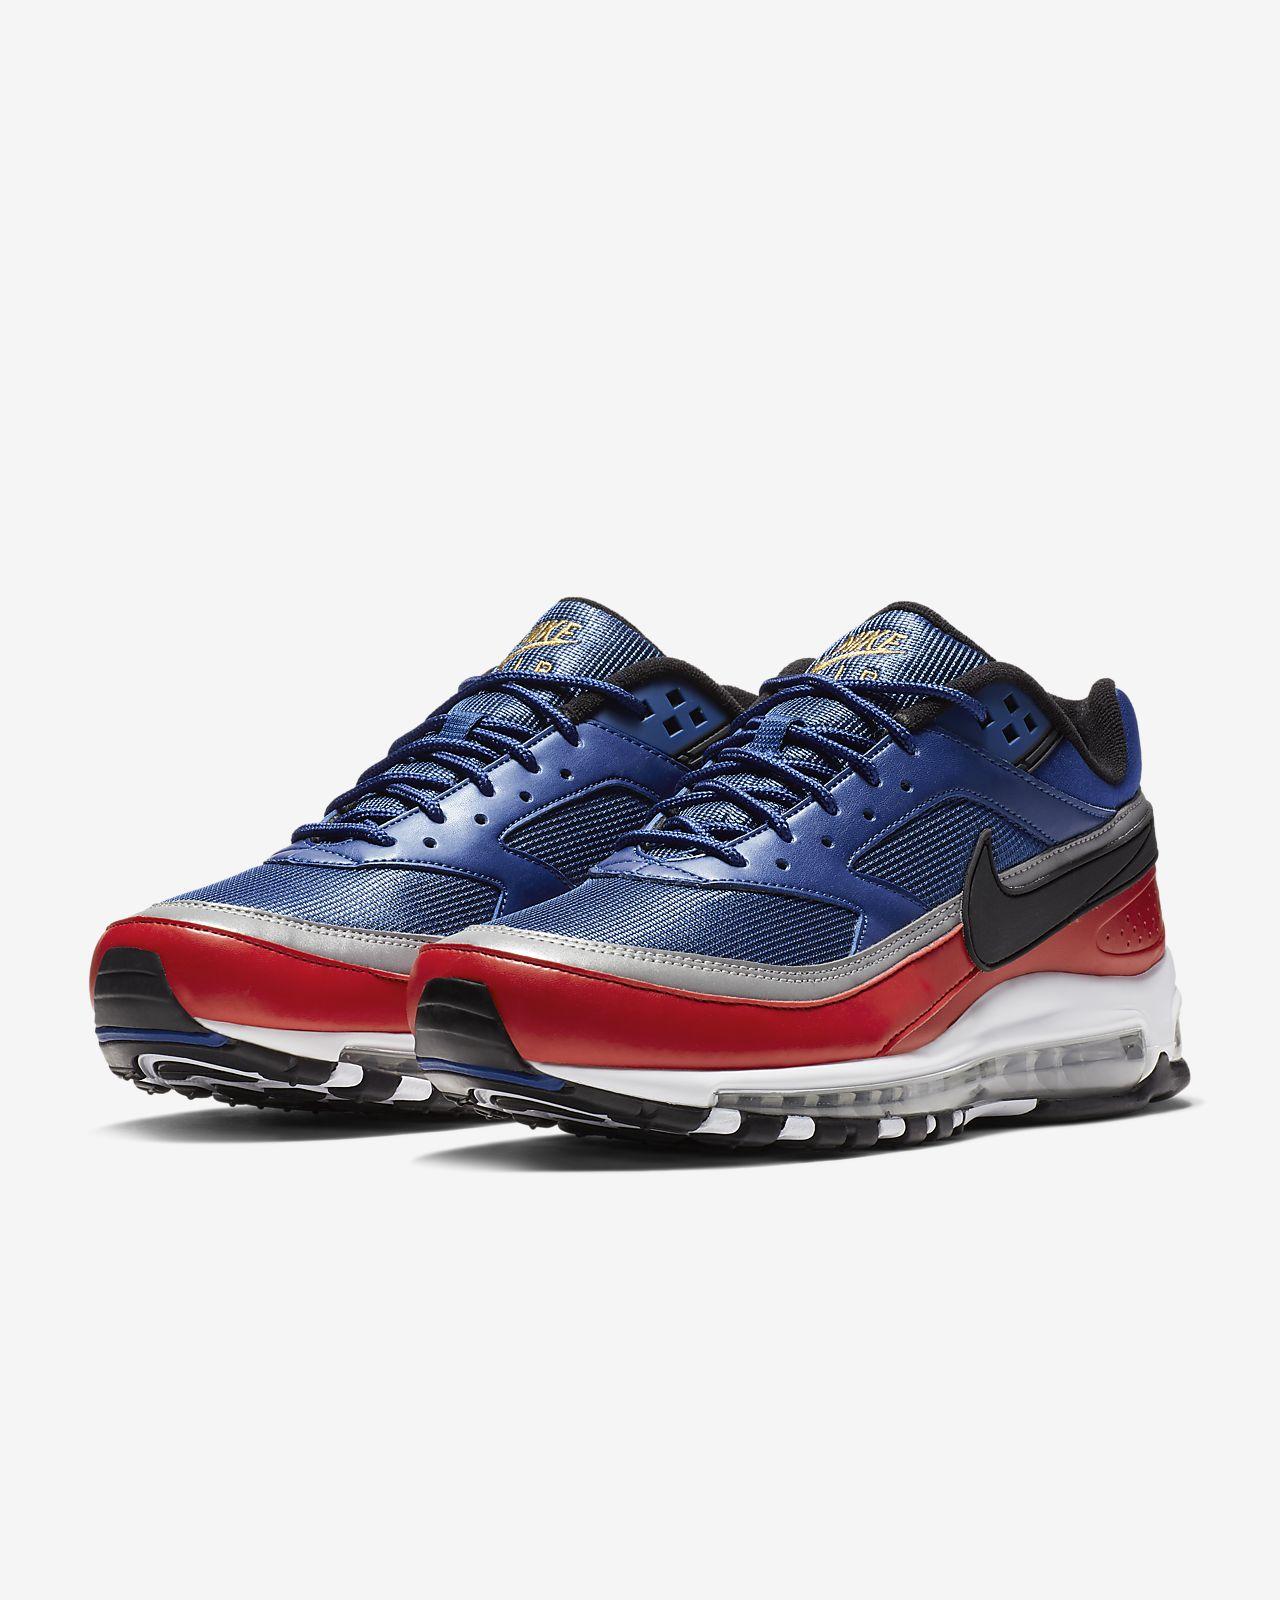 competitive price 13c75 91c2b ... Nike Air Max 97 BW Men s Shoe